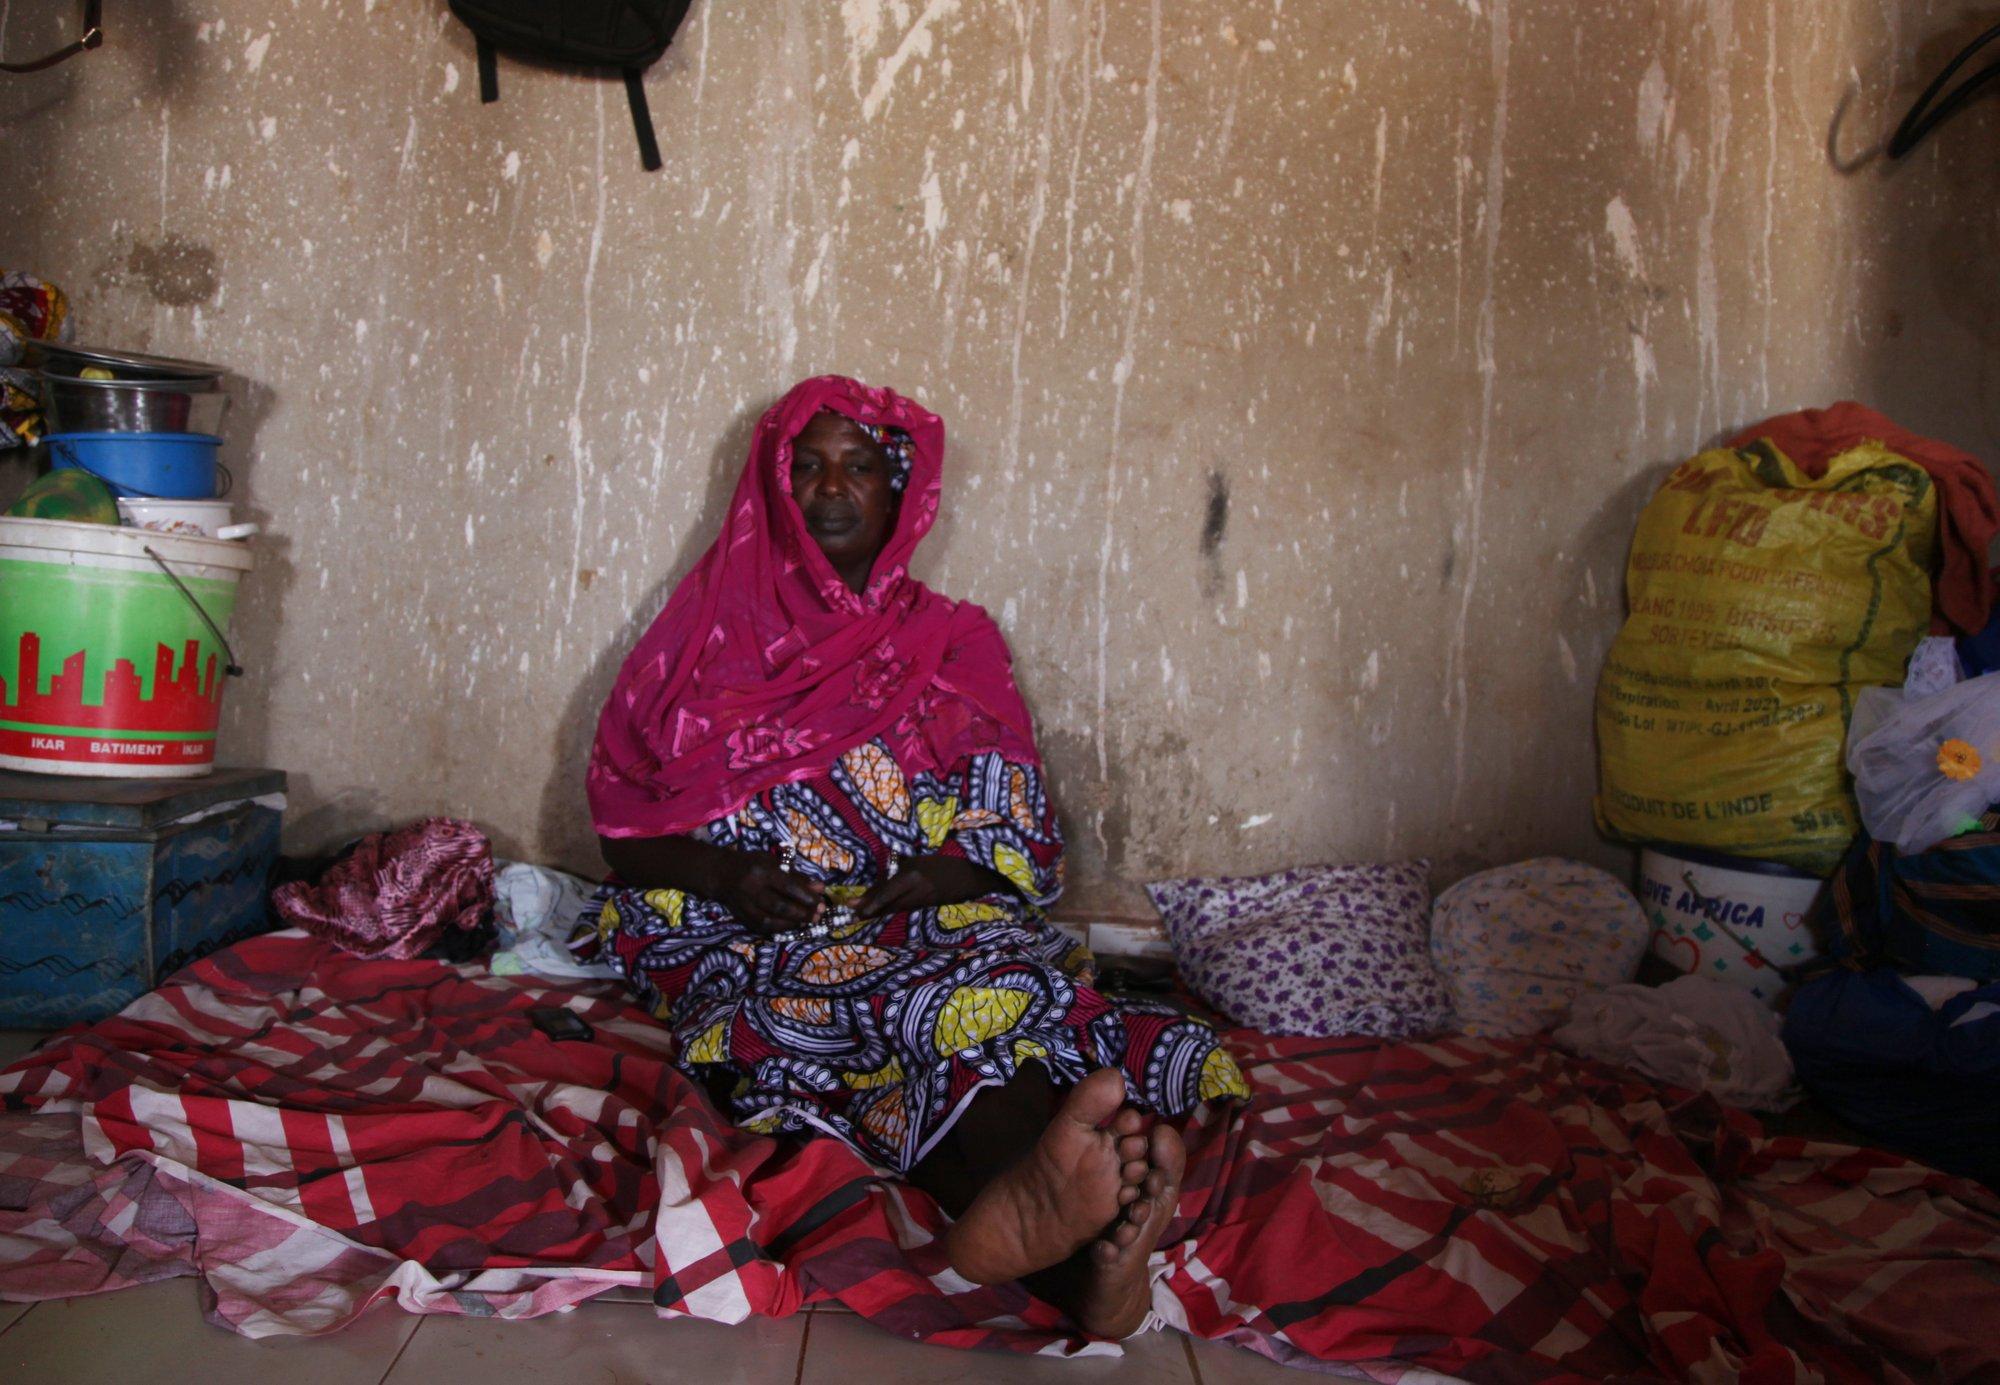 'I'm going to die': Survivor recounts Mali ethnic massacre